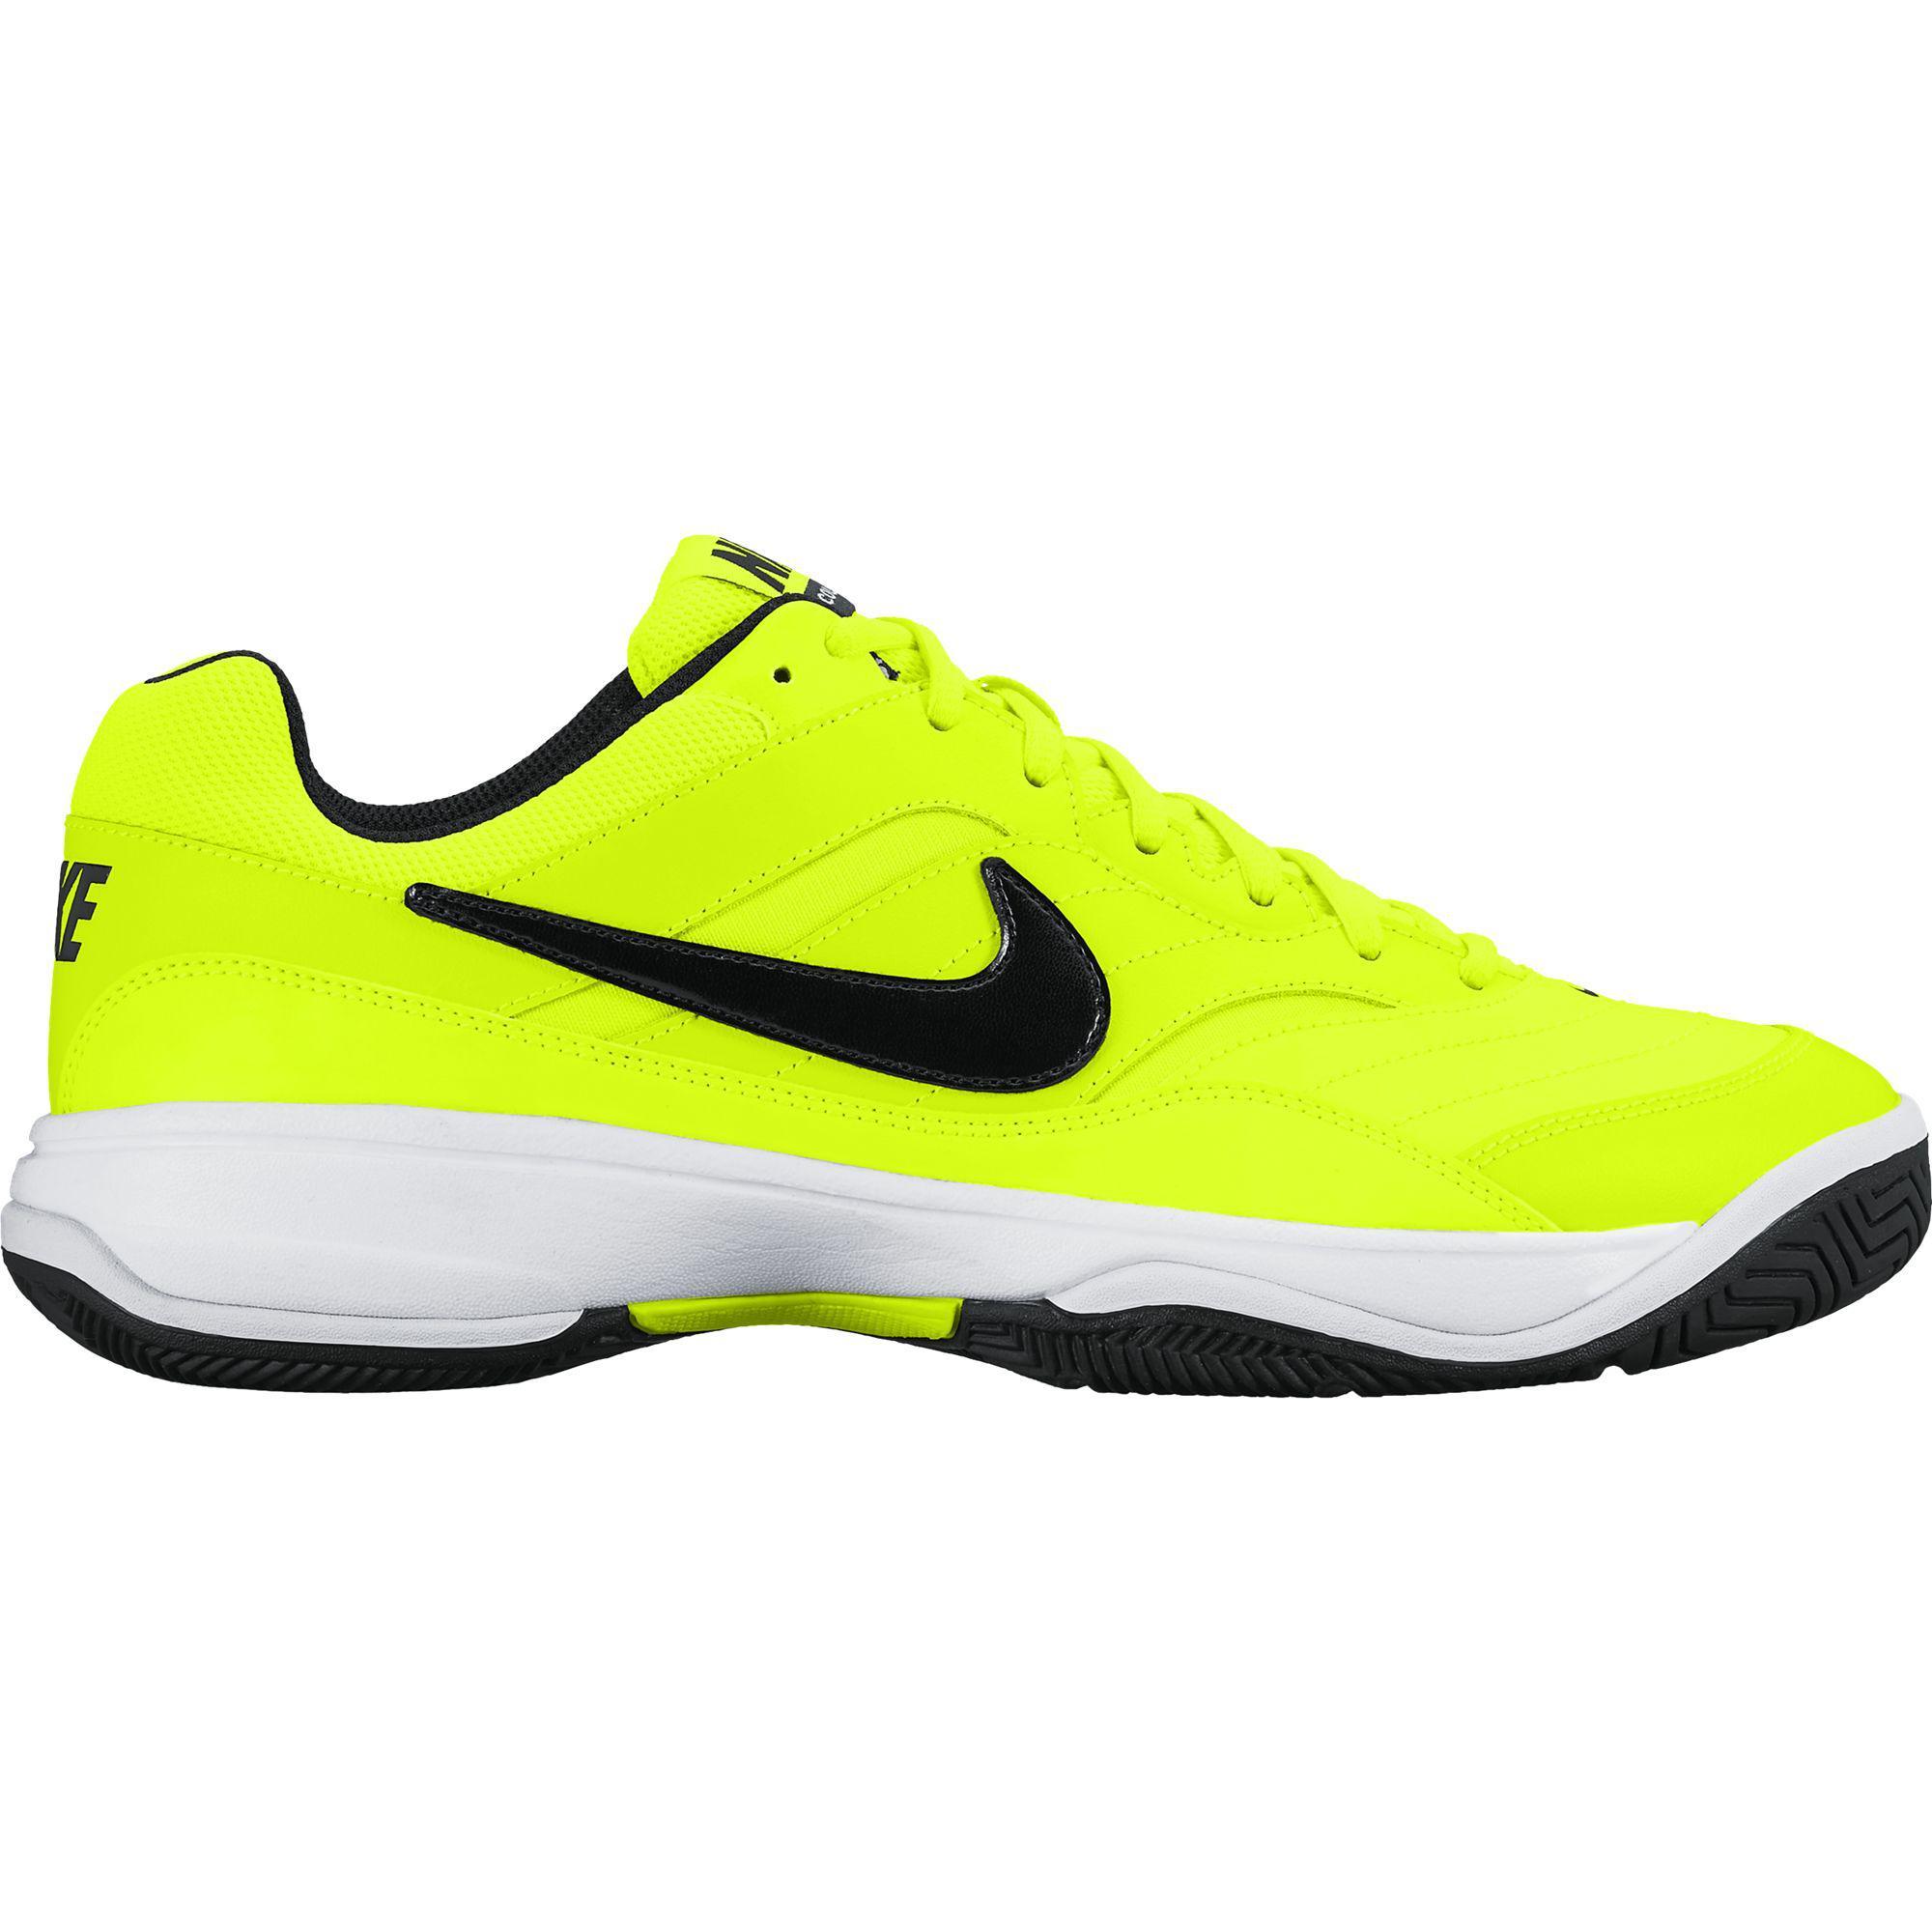 Nike Mens Court Lite Tennis Shoes